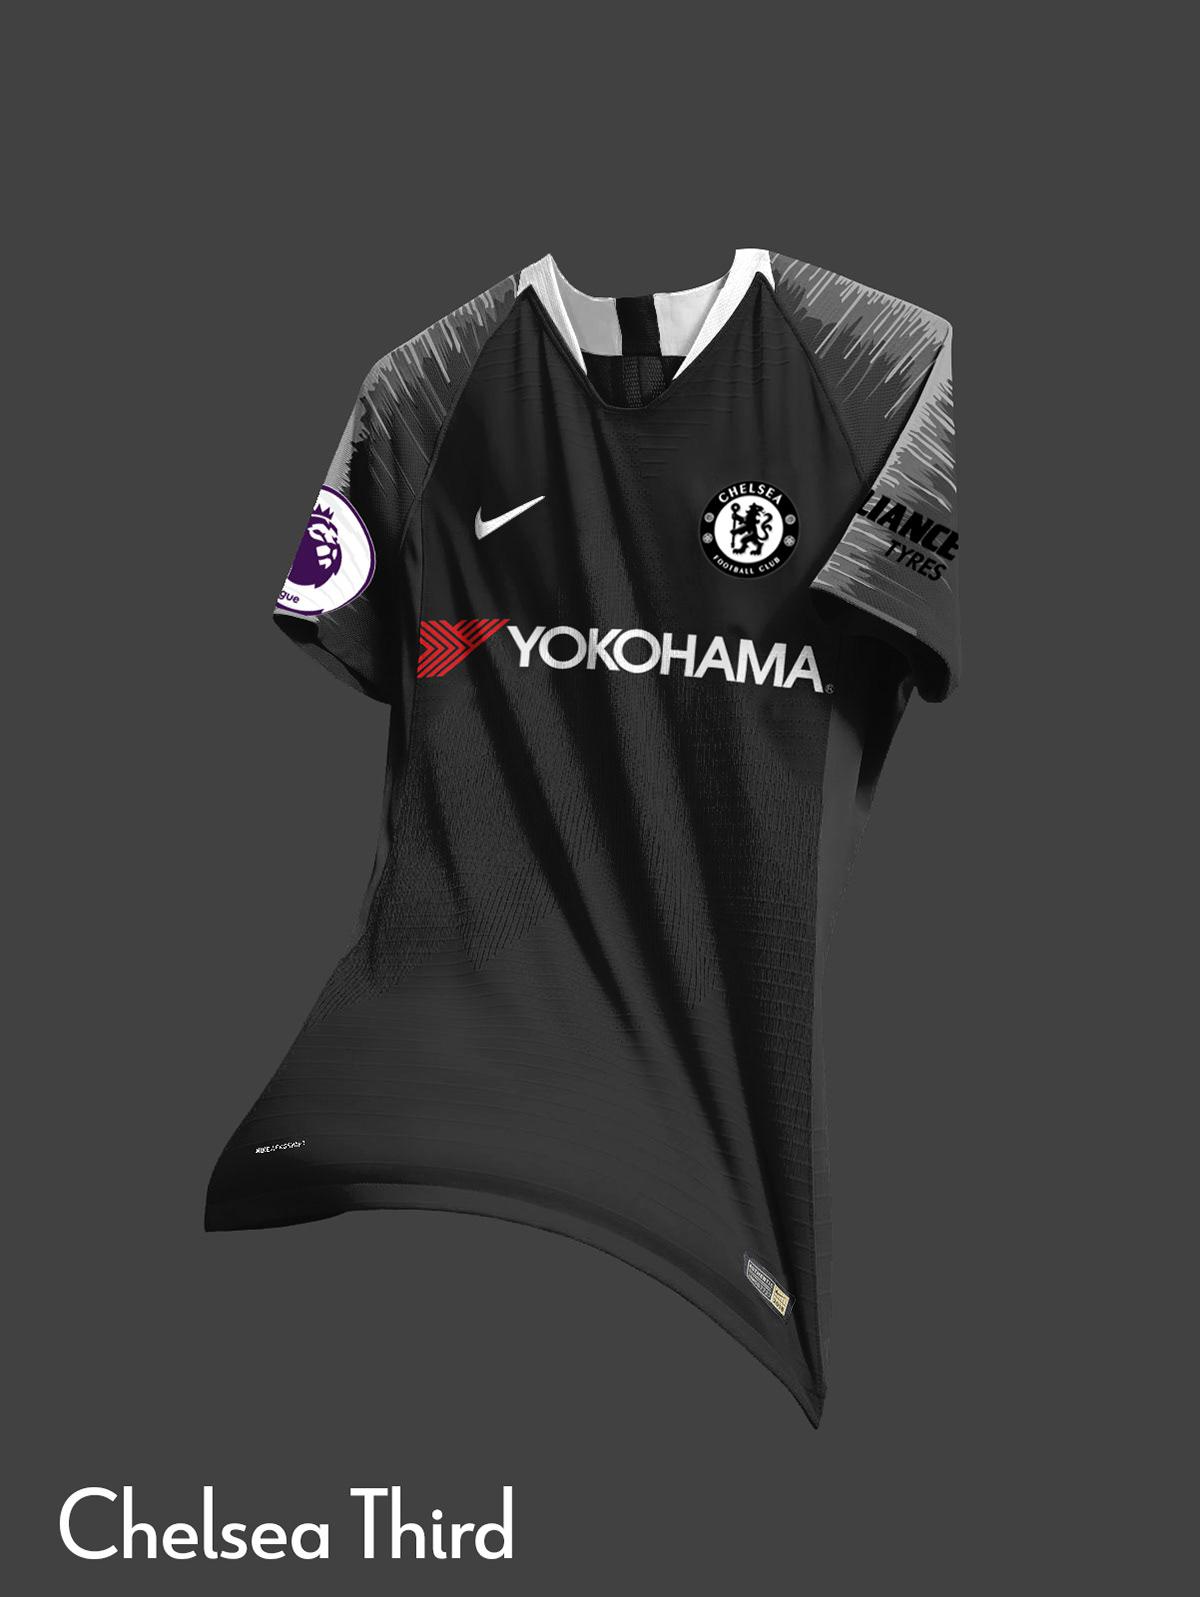 Nike Chelsea Concept Kits 2018 19 On Behance